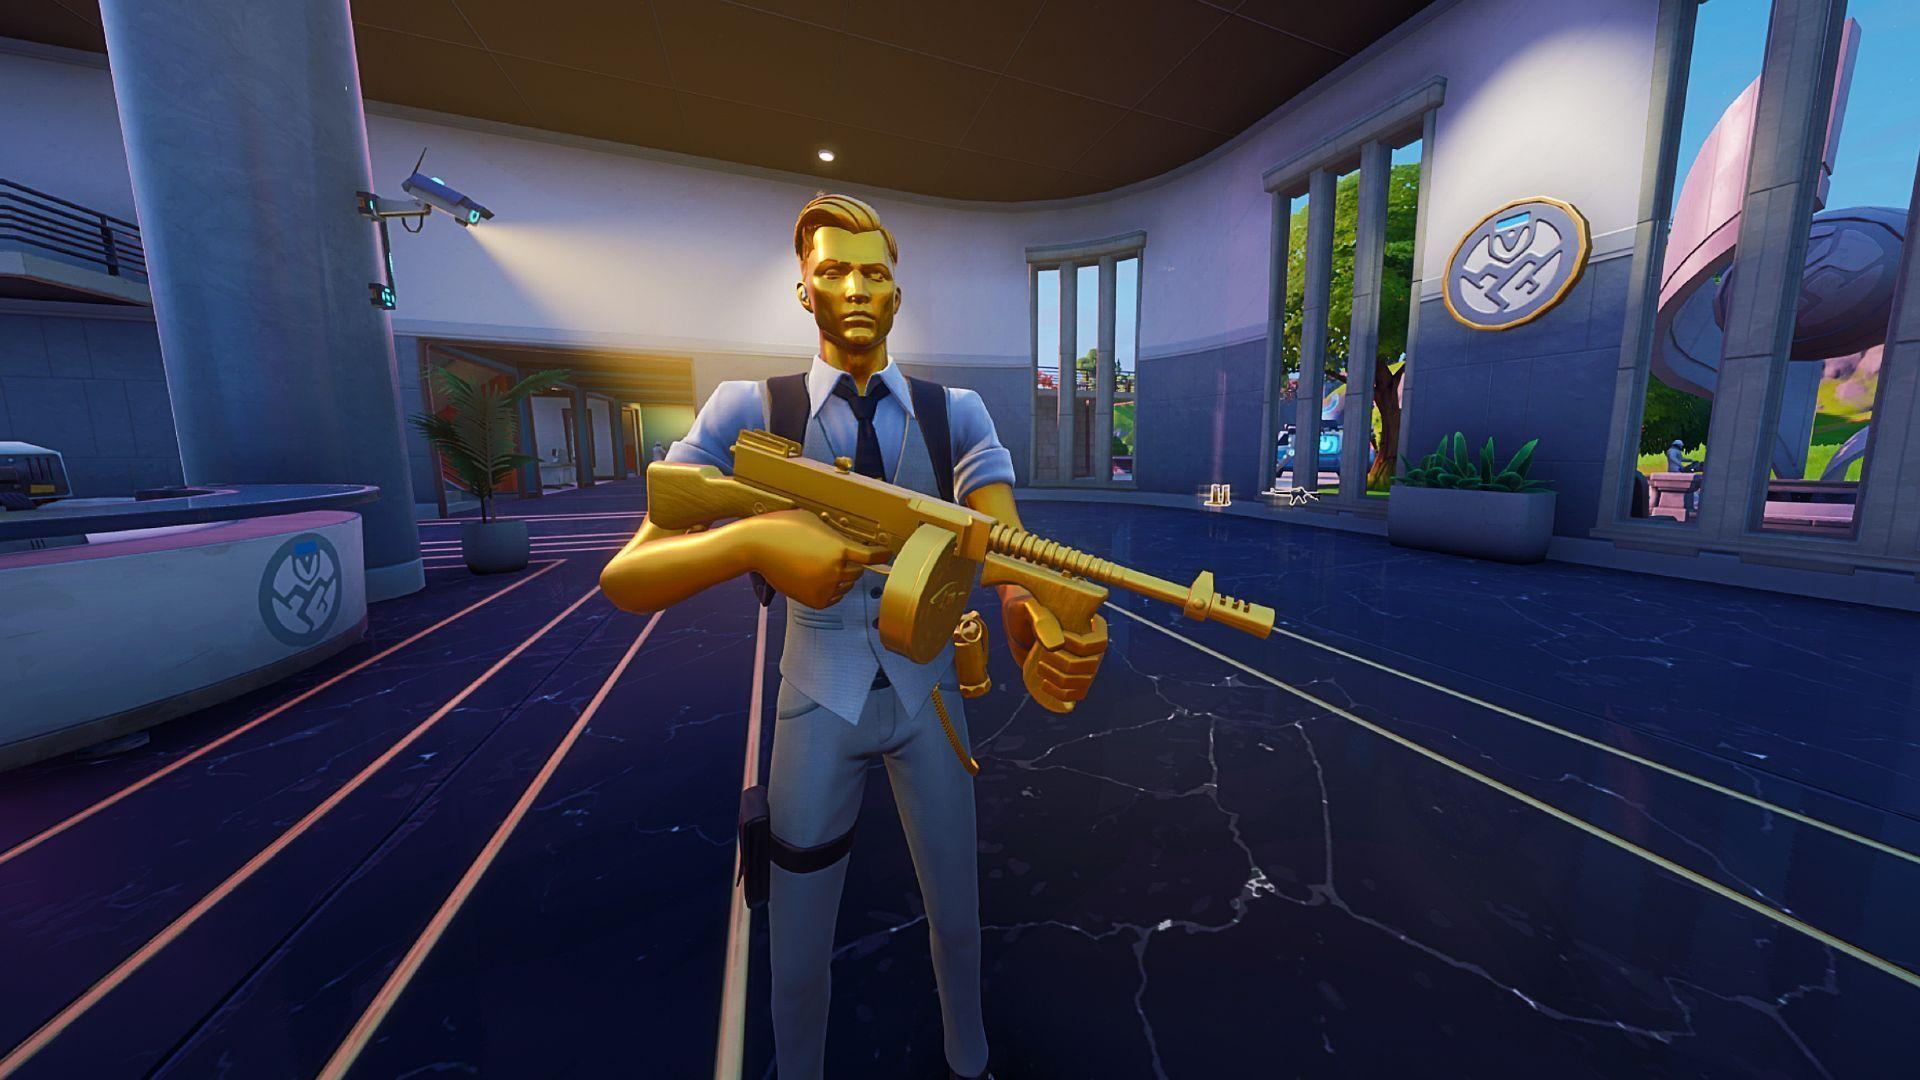 pistolet-mitrailleur tambour Midas Fortnite Epic Games